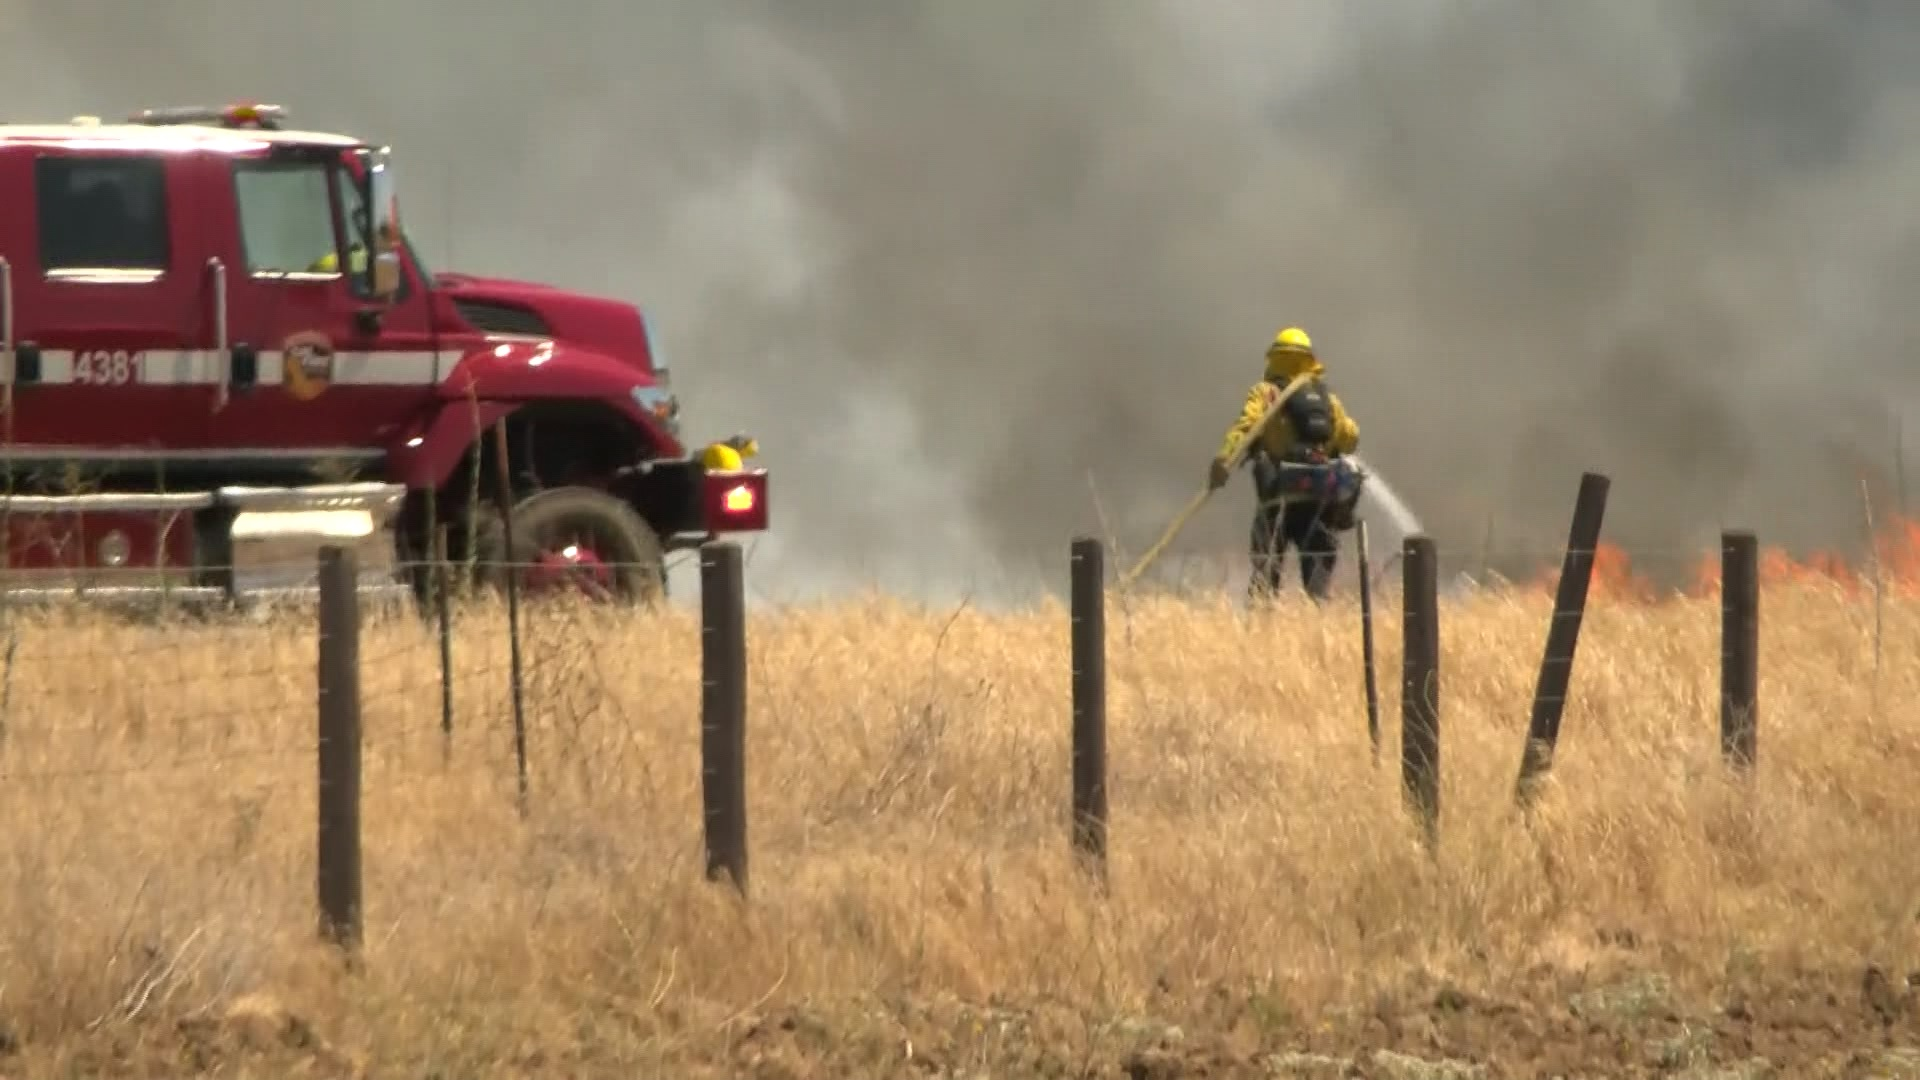 Crews respond to wildland fire outside Clovis